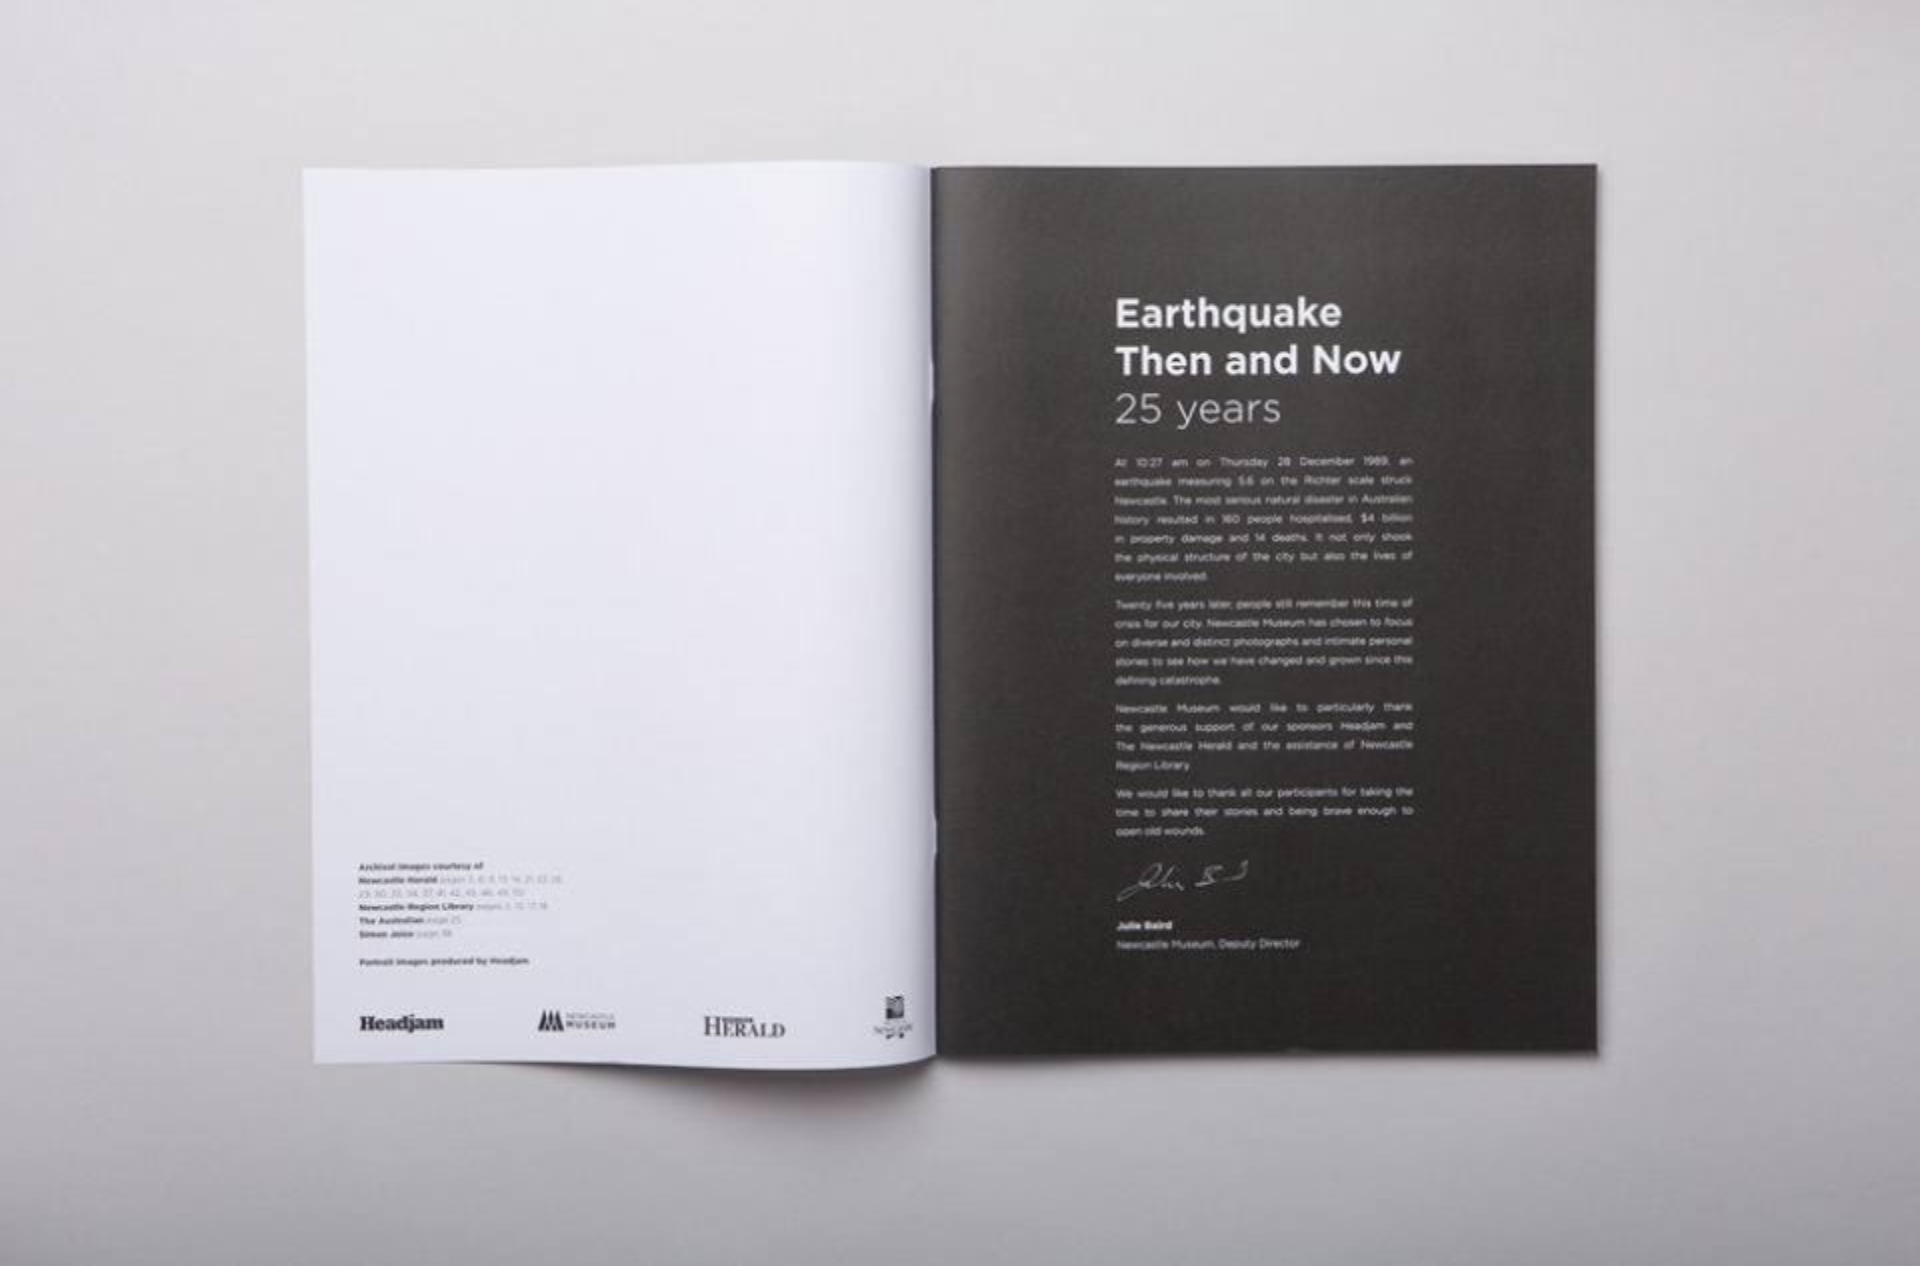 Headjam newcastle museum earthquake 002